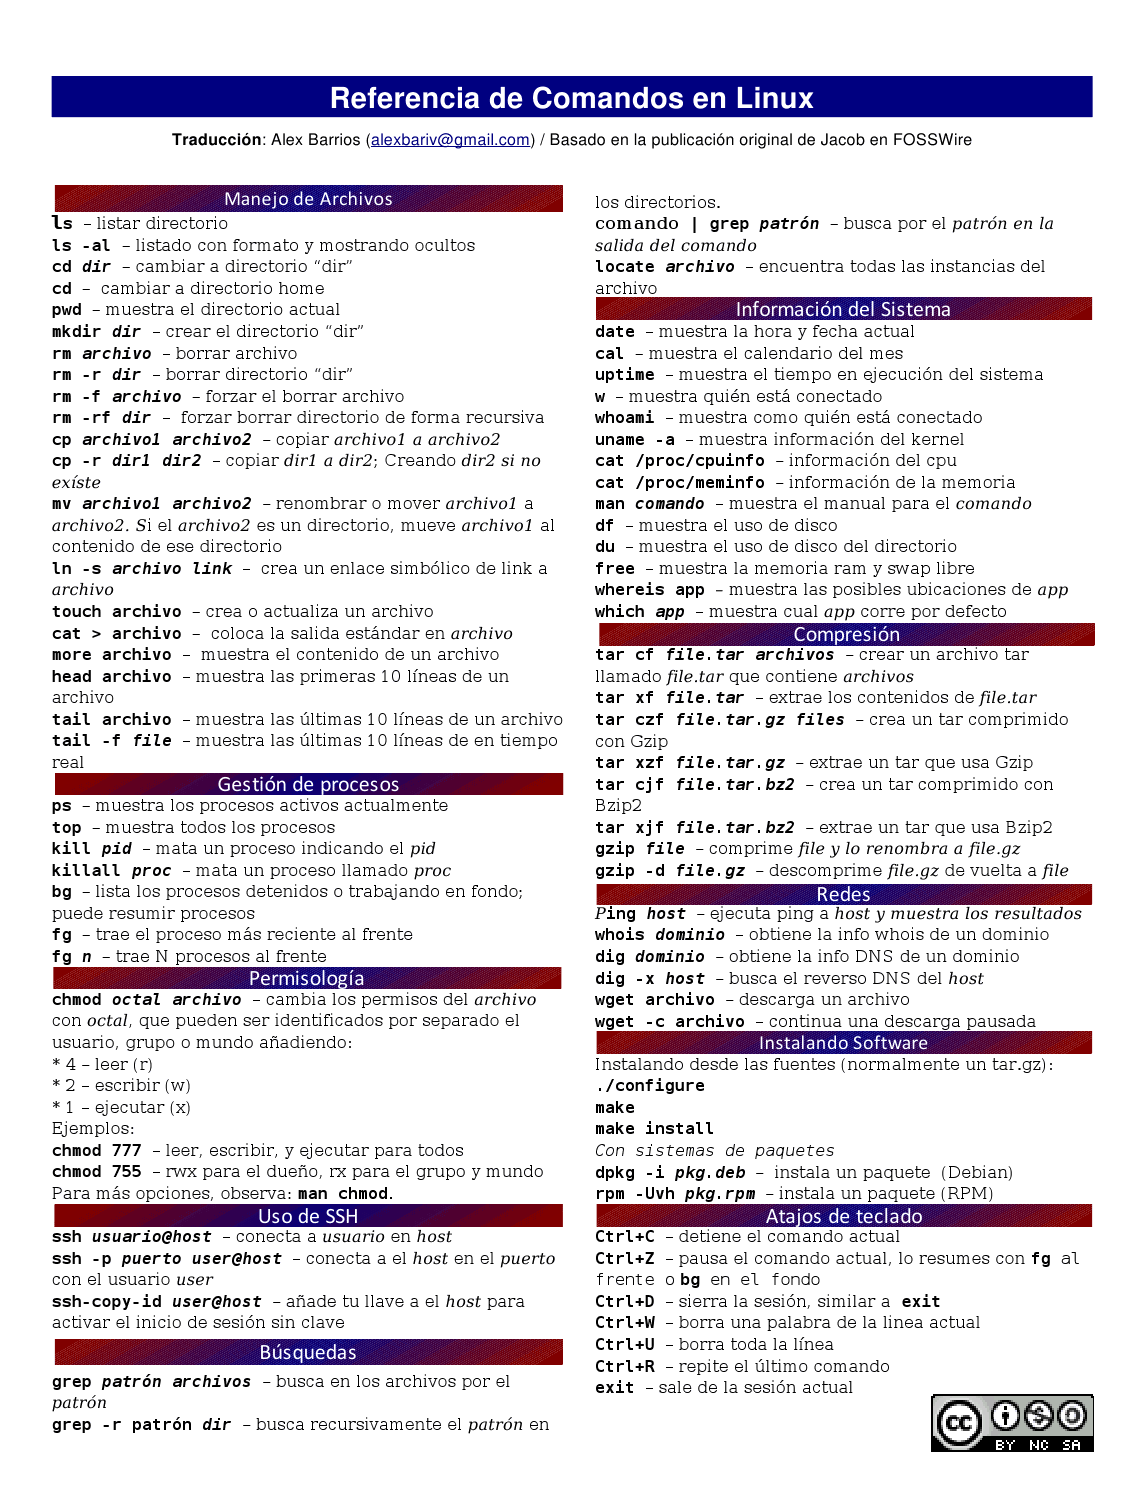 Comandos basicos de linux en español.